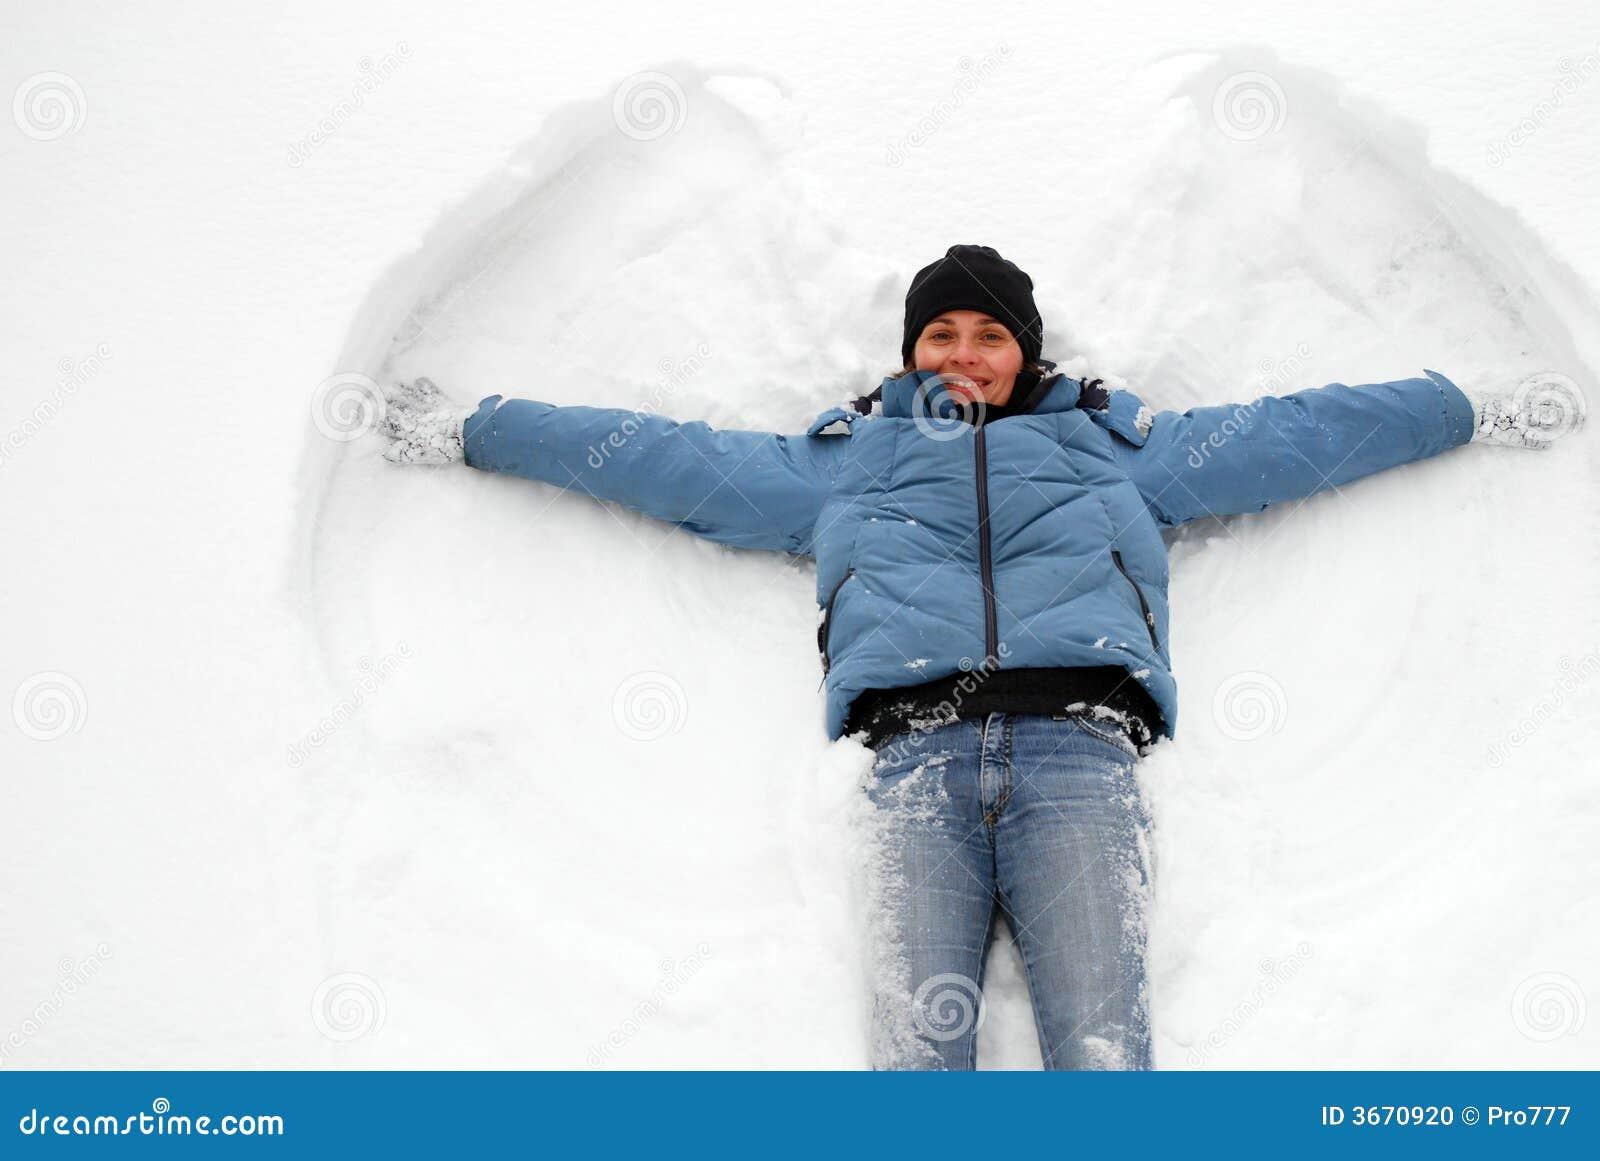 Snow angel stock photo image of child female lady